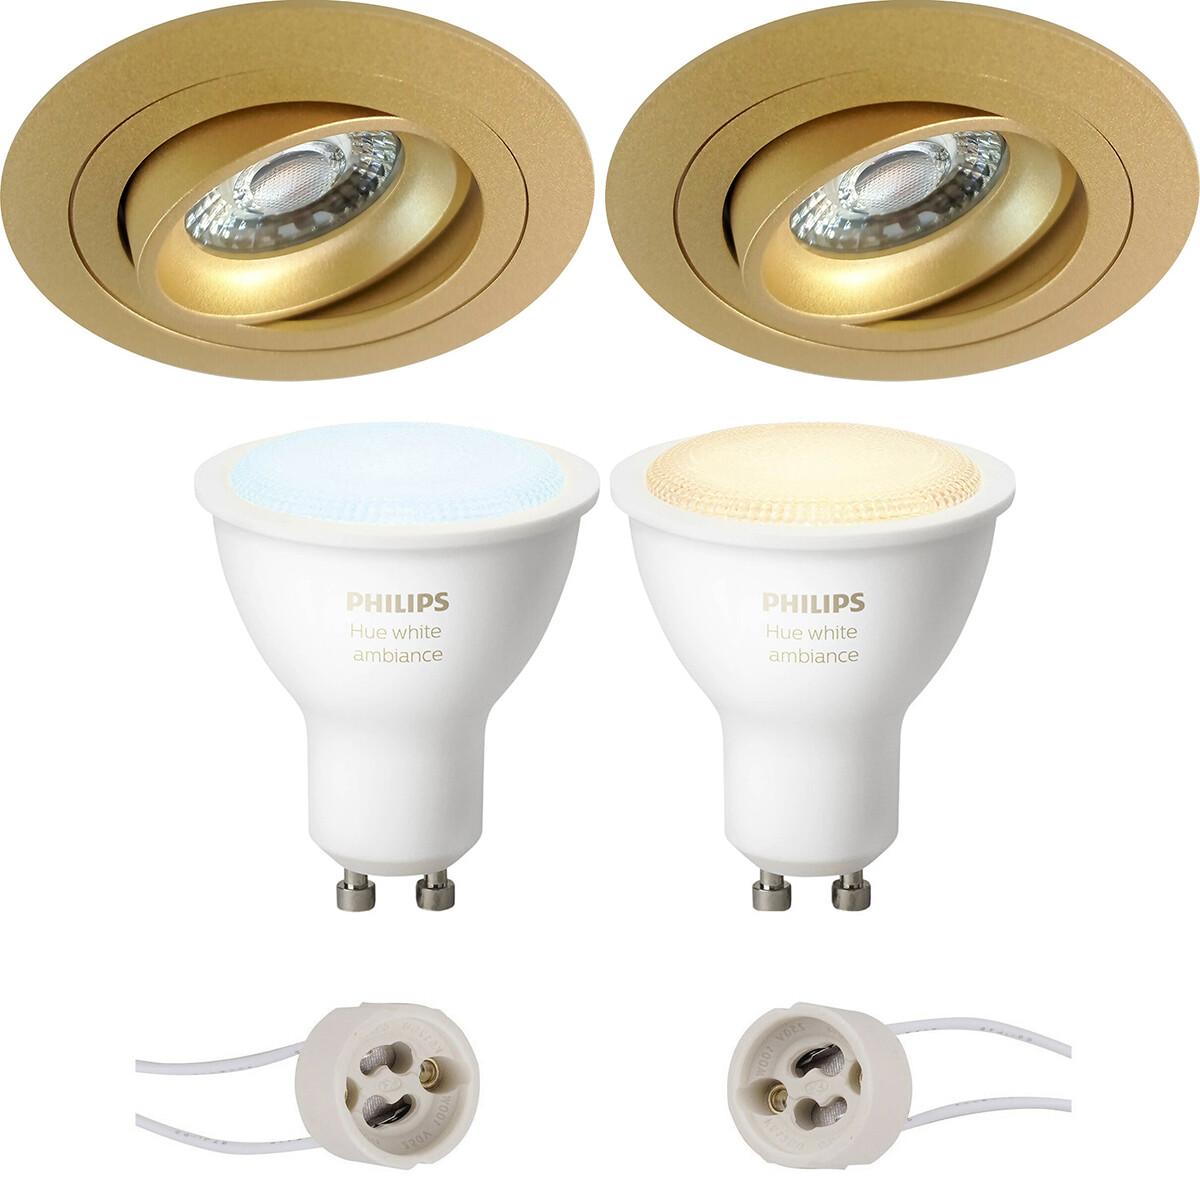 Pragmi Alpin Pro - Inbouw Rond - Mat Goud - Kantelbaar - Ø92mm - Philips Hue - LED Spot Set GU10 - W